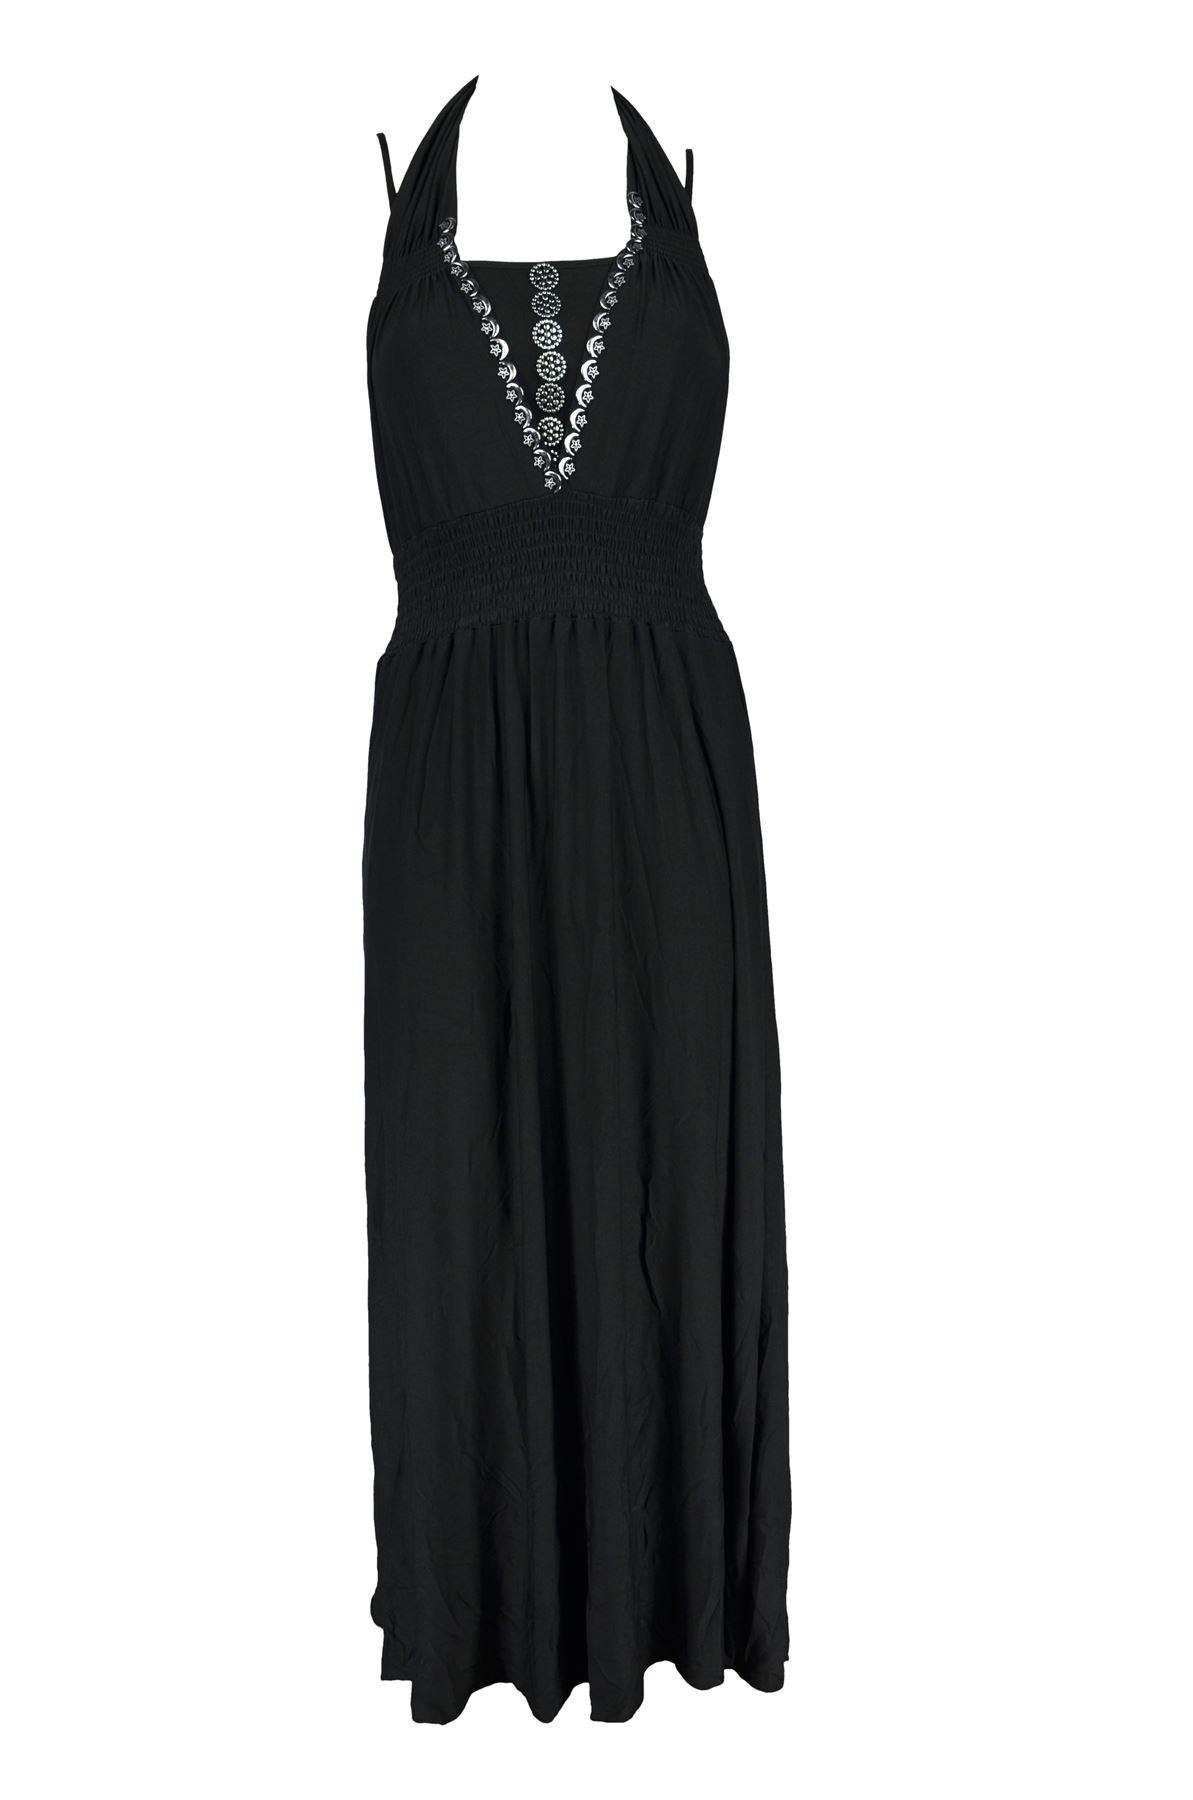 Belle Donne -Women Maxi Dress Summer Dress Top Halterneck Fashion Long Dress - Black